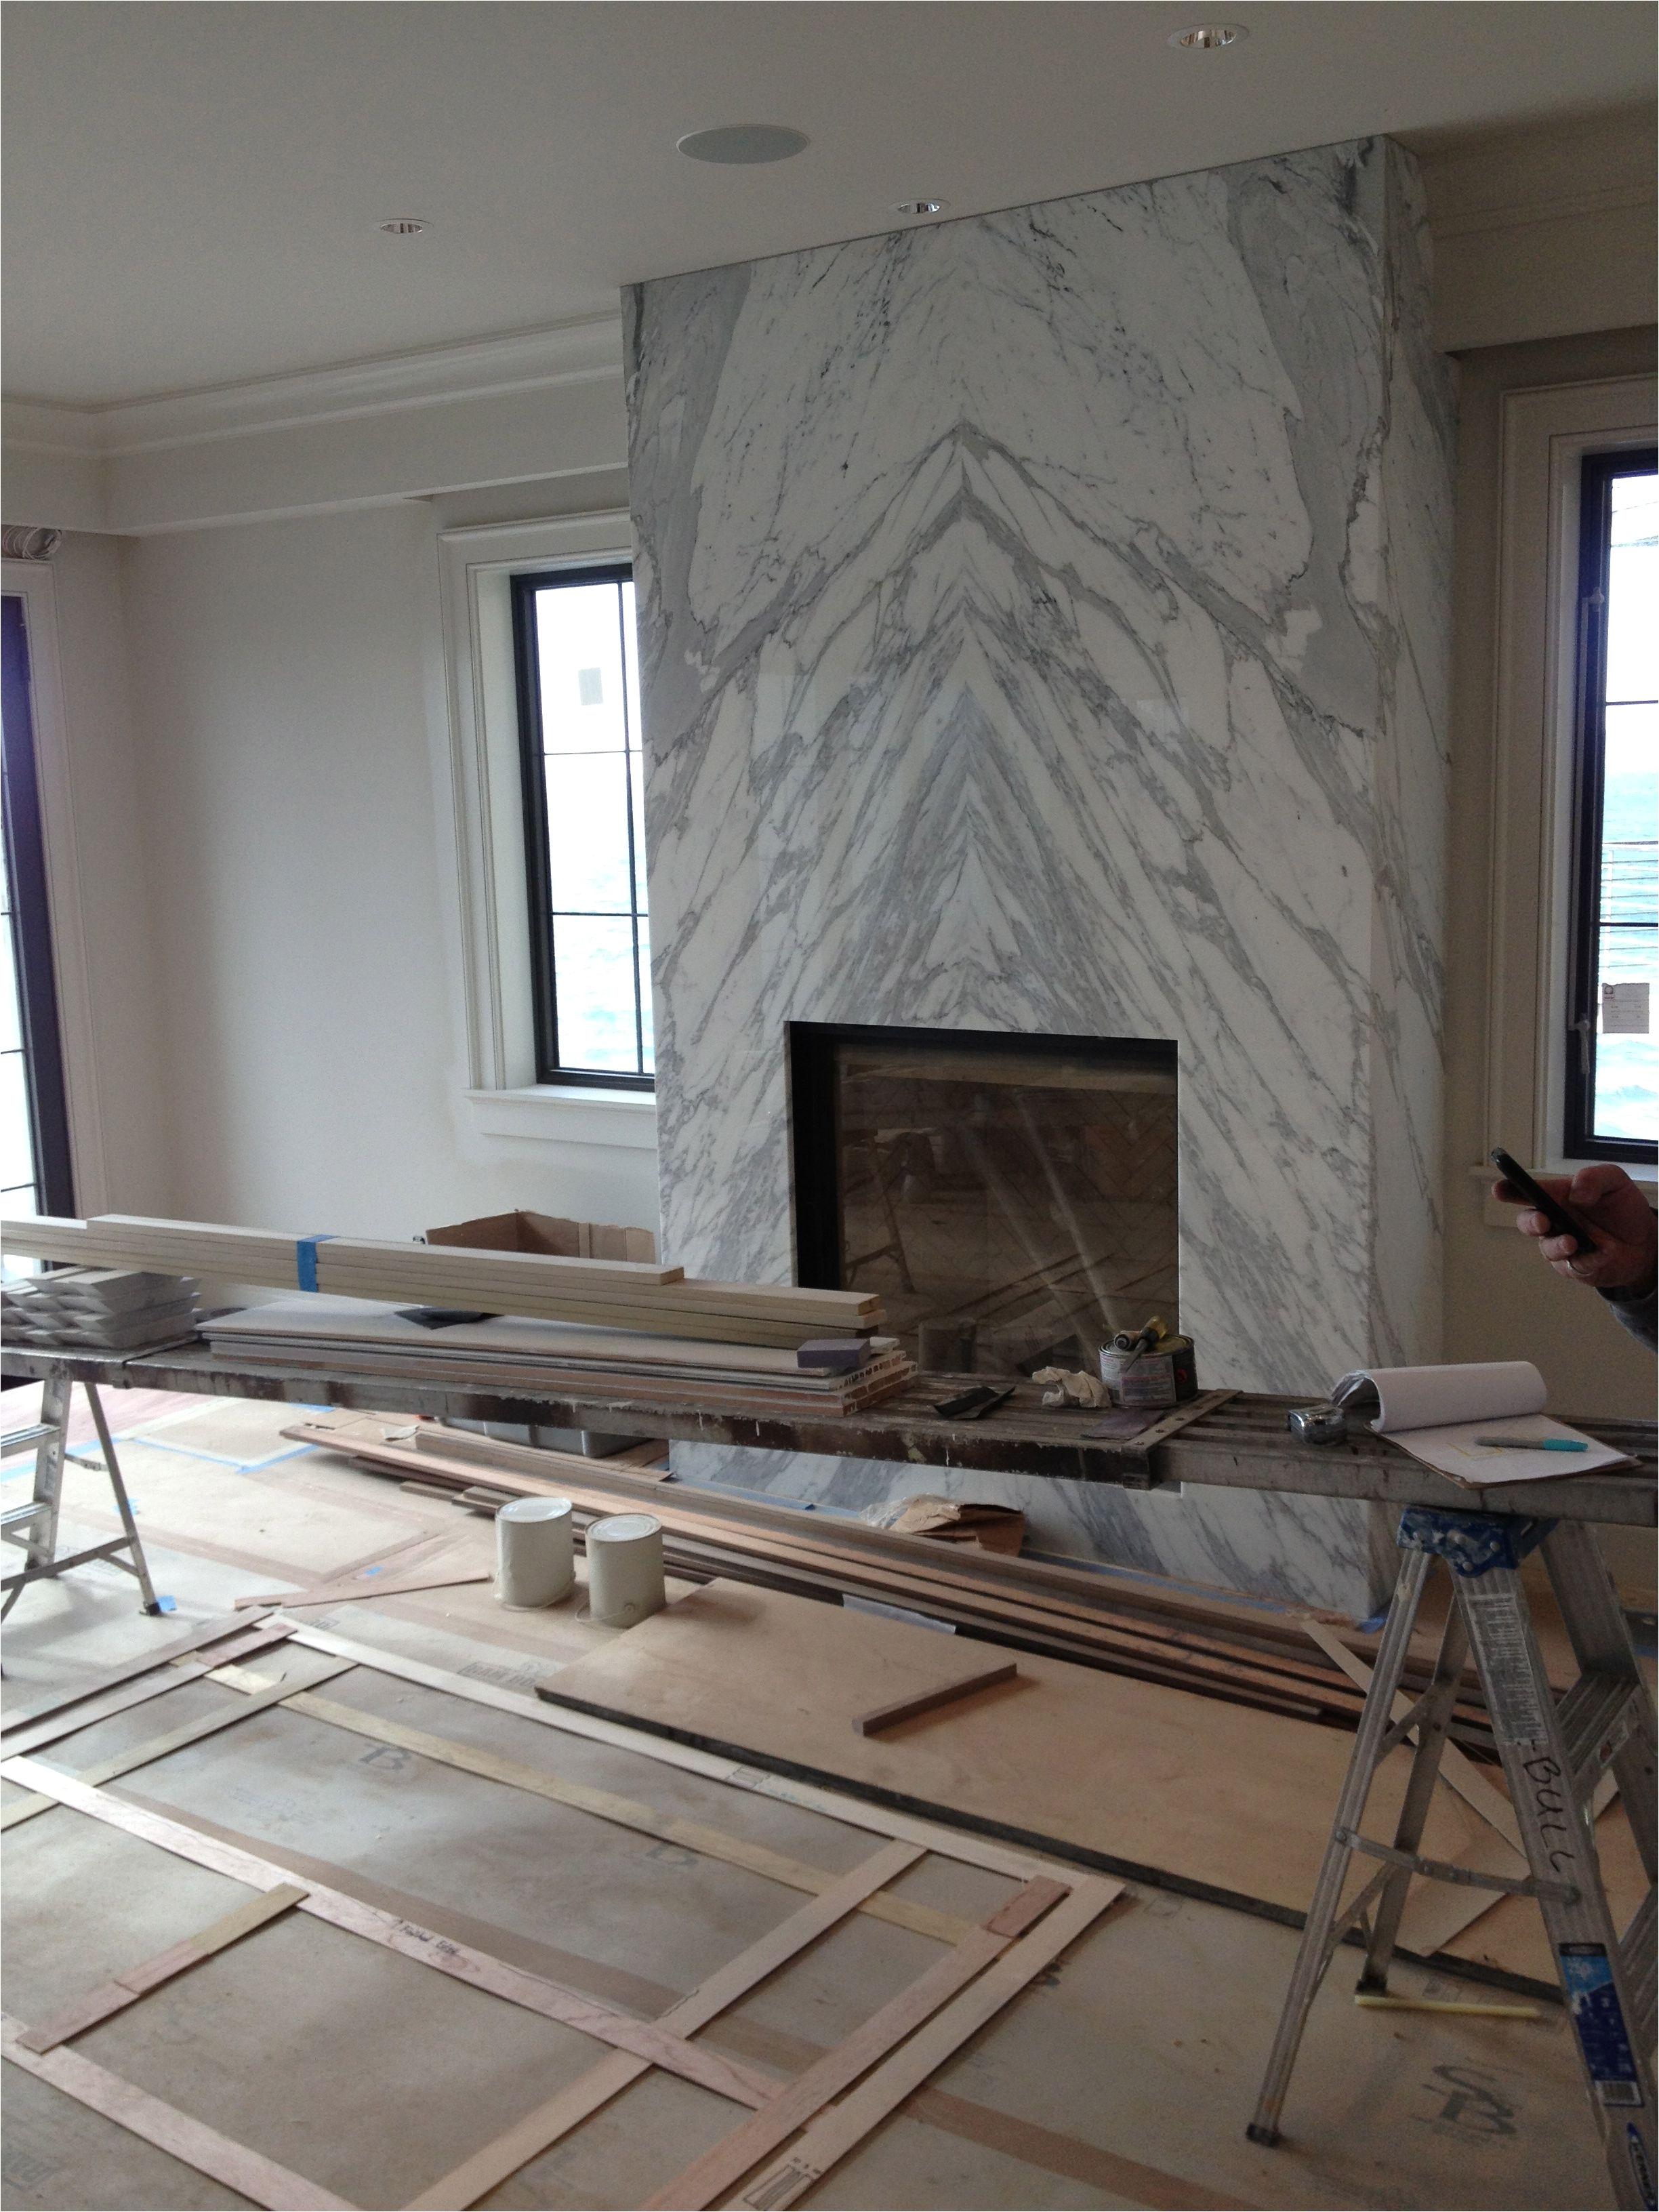 How to Build A Gas Fireplace Surround Contemporary Slab Stone Fireplace Calacutta Carrara Marble Book